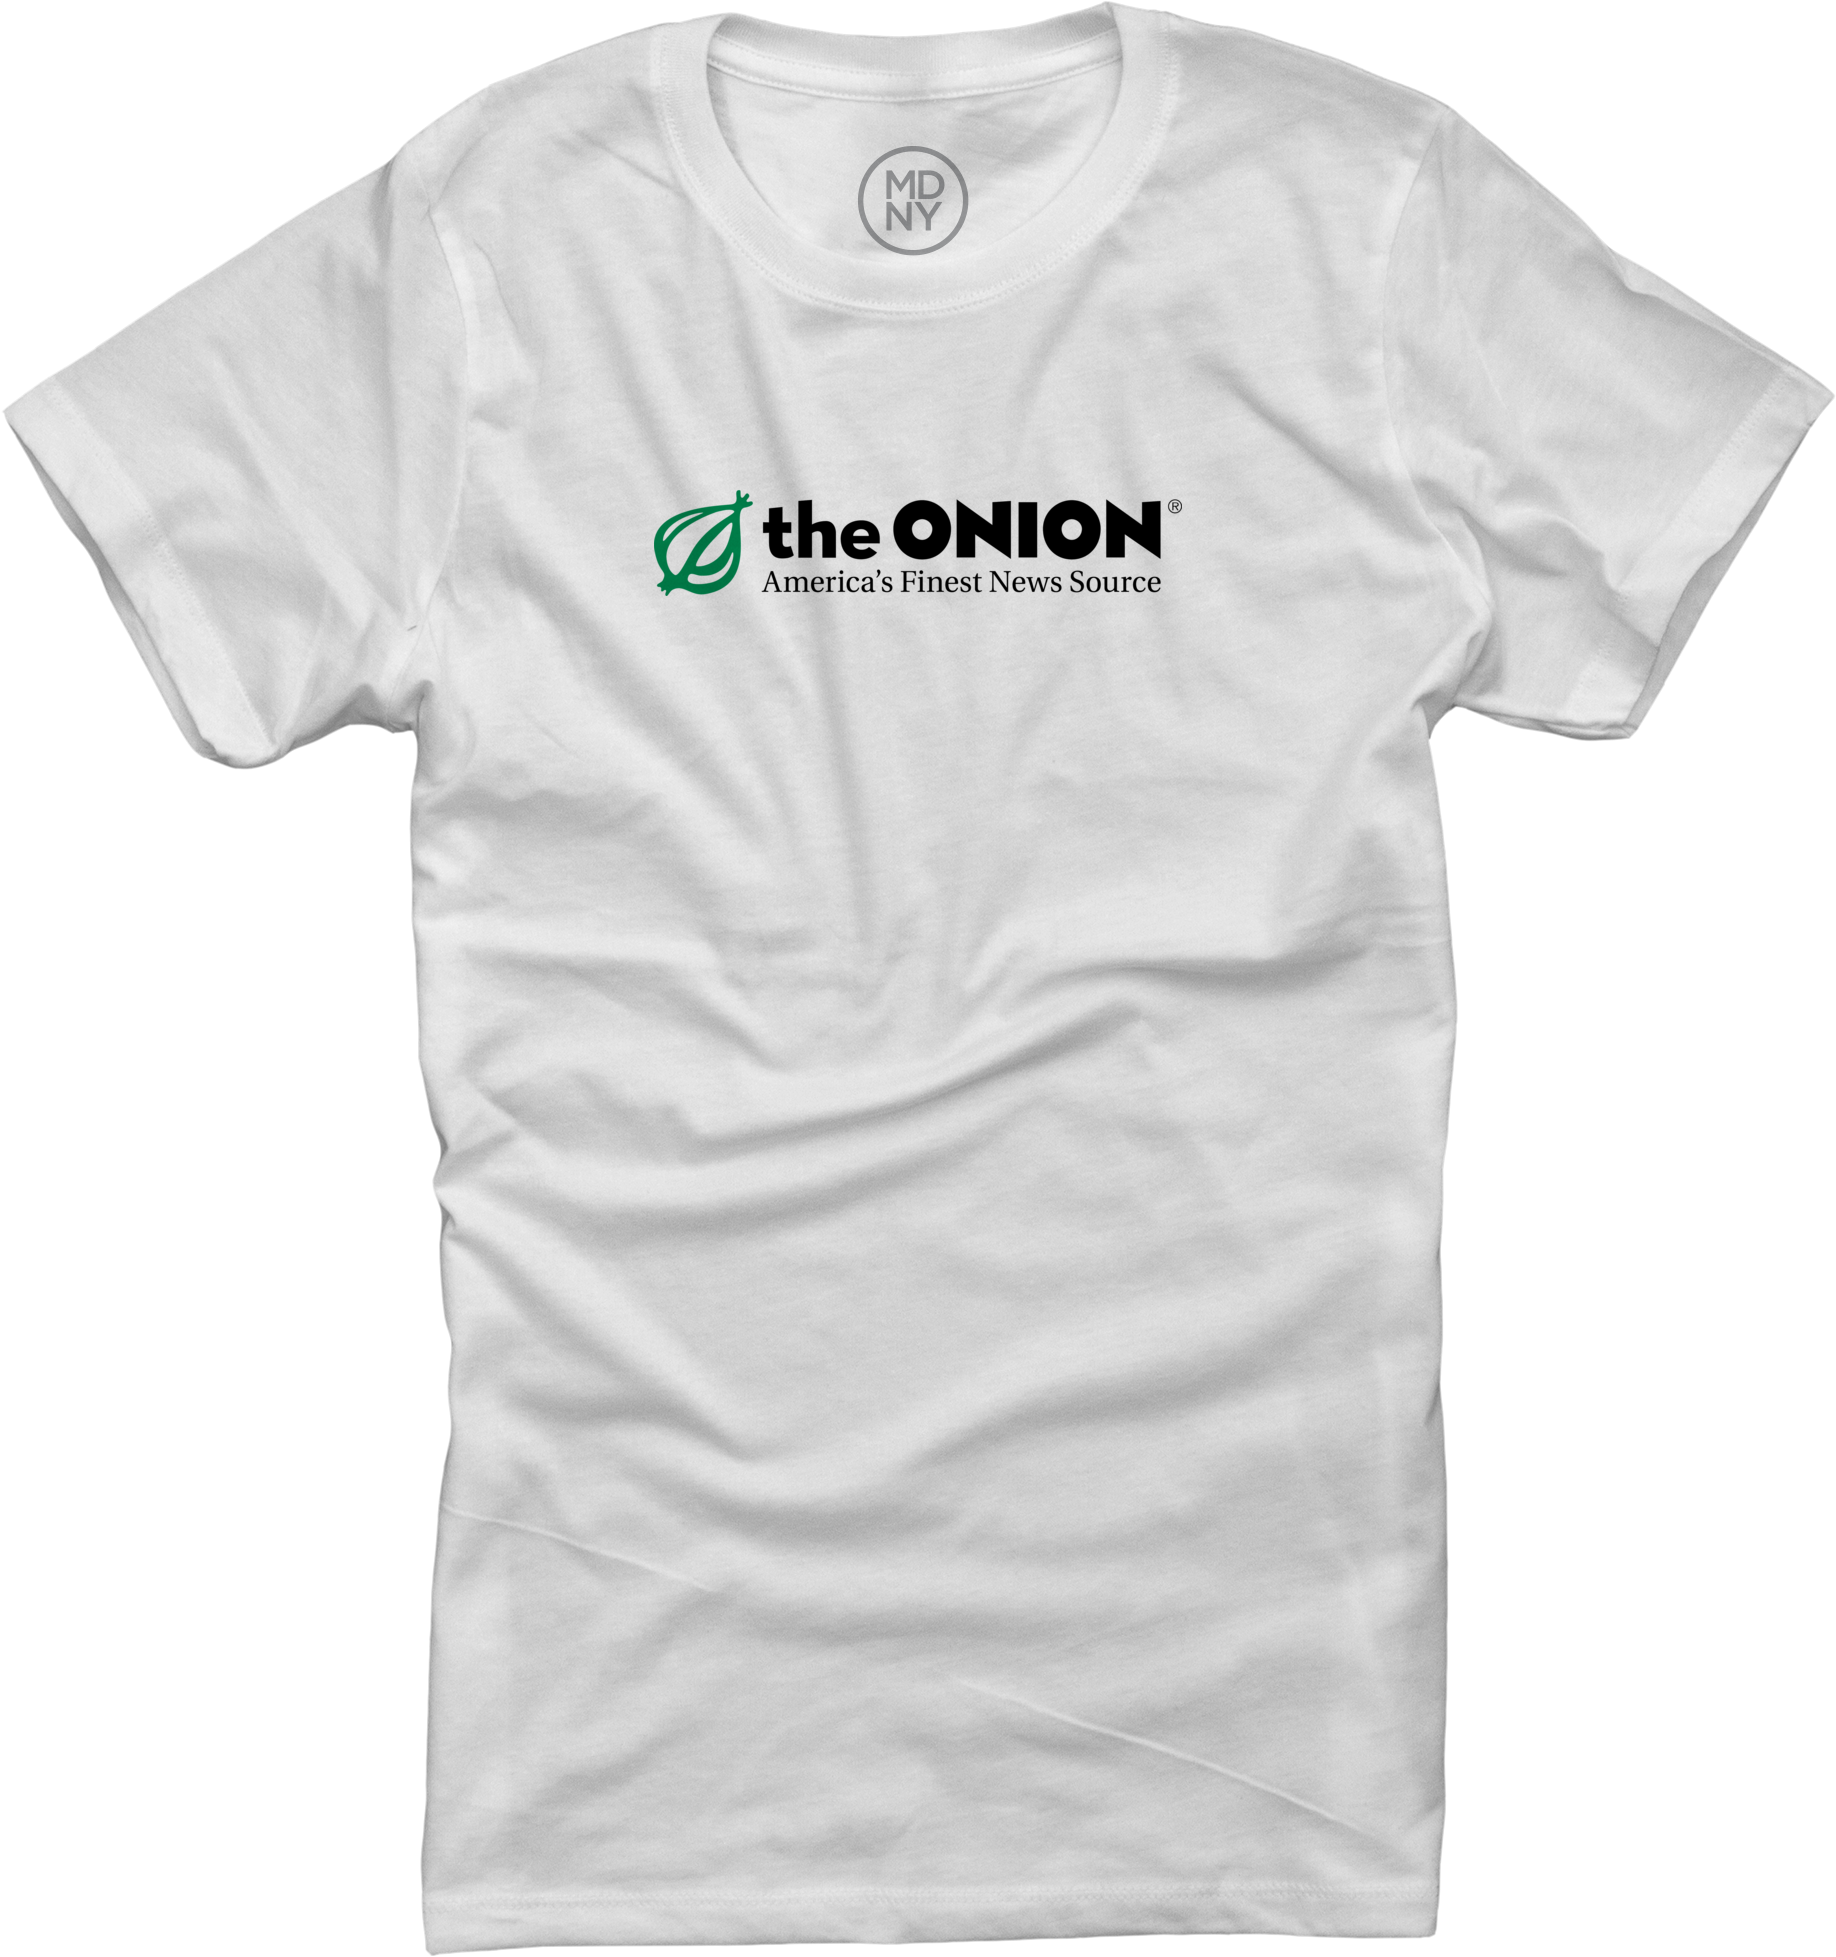 The Onion on Women's White T-shirt